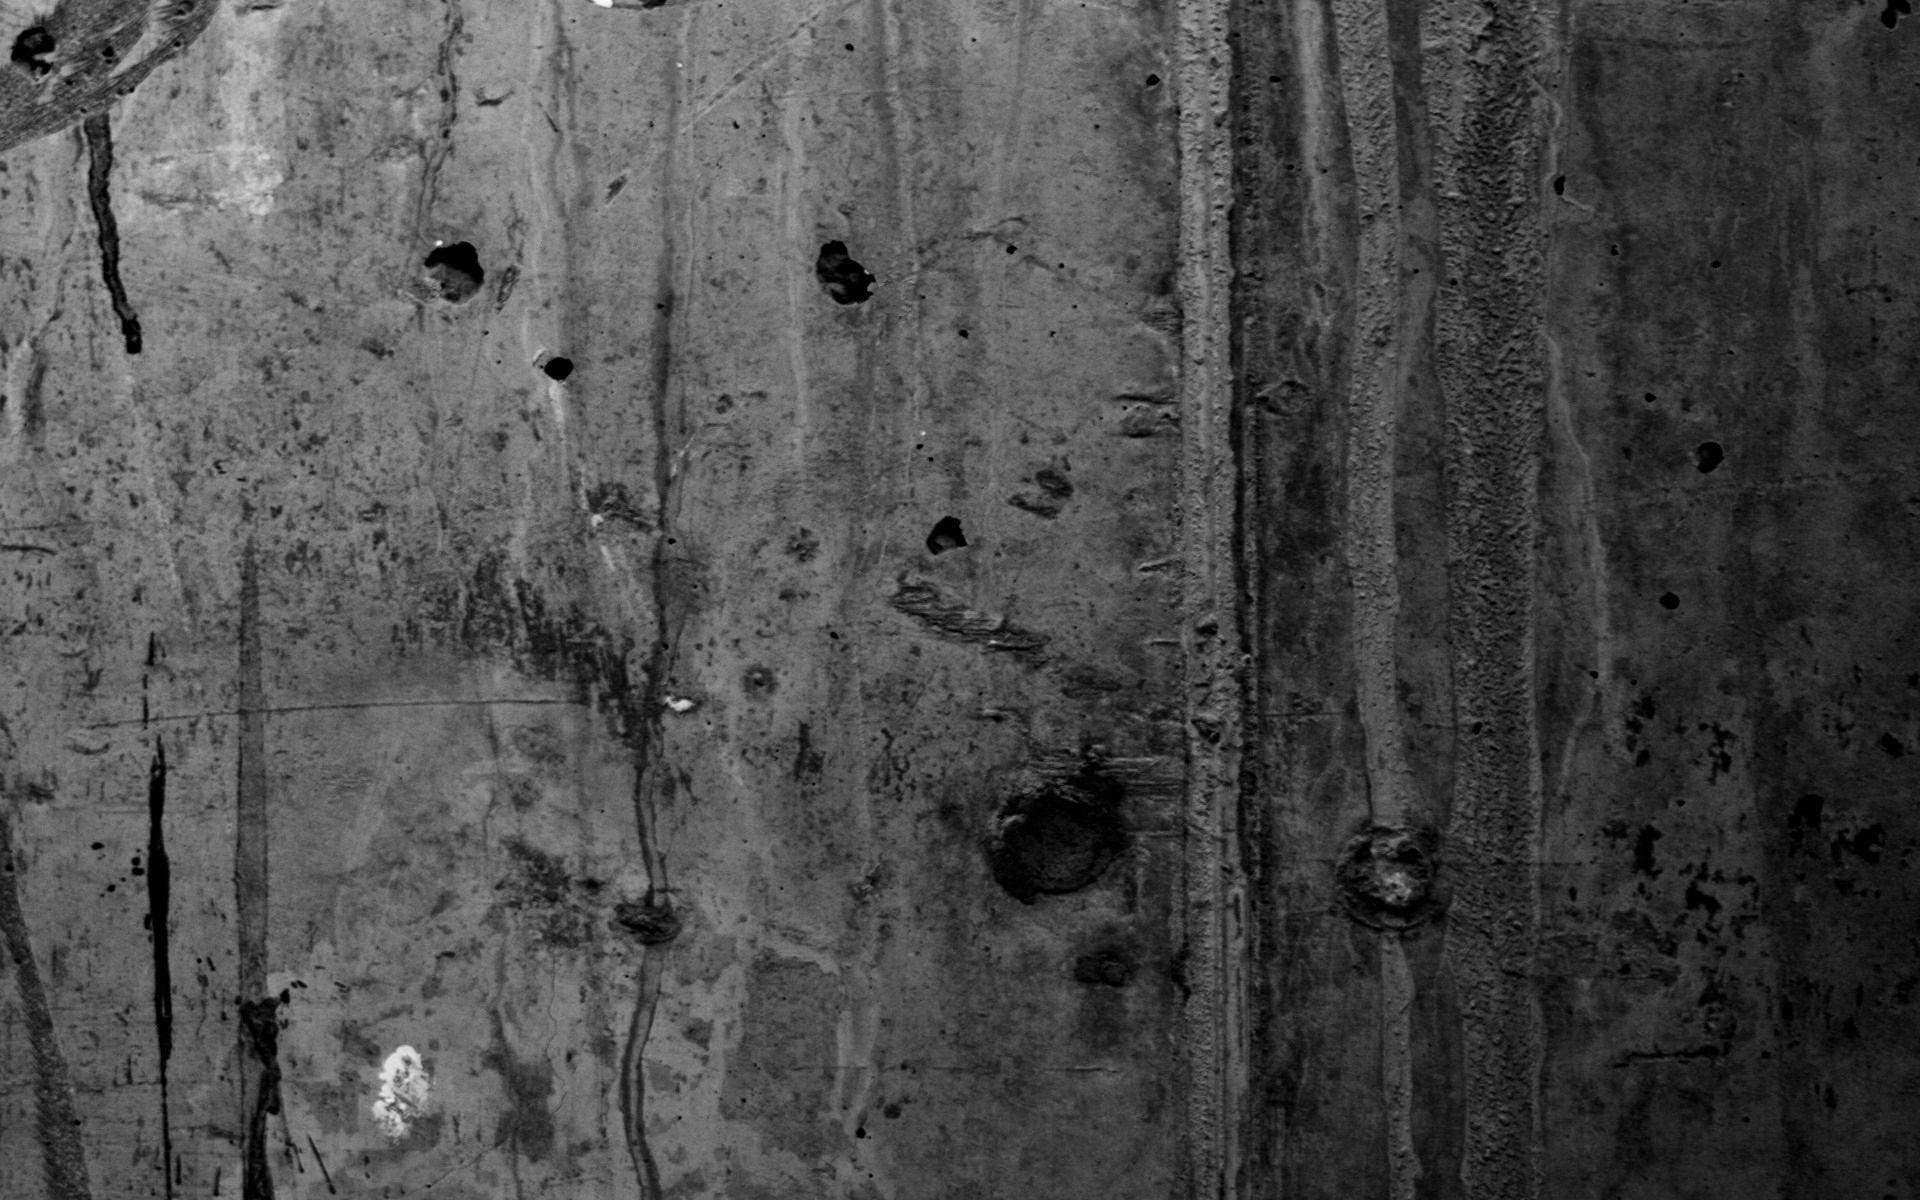 Full Size Black And Grey Desktop Wallpaper 1920x1080 Black Abstract Background Minimalist Wallpaper Black Desktop Background